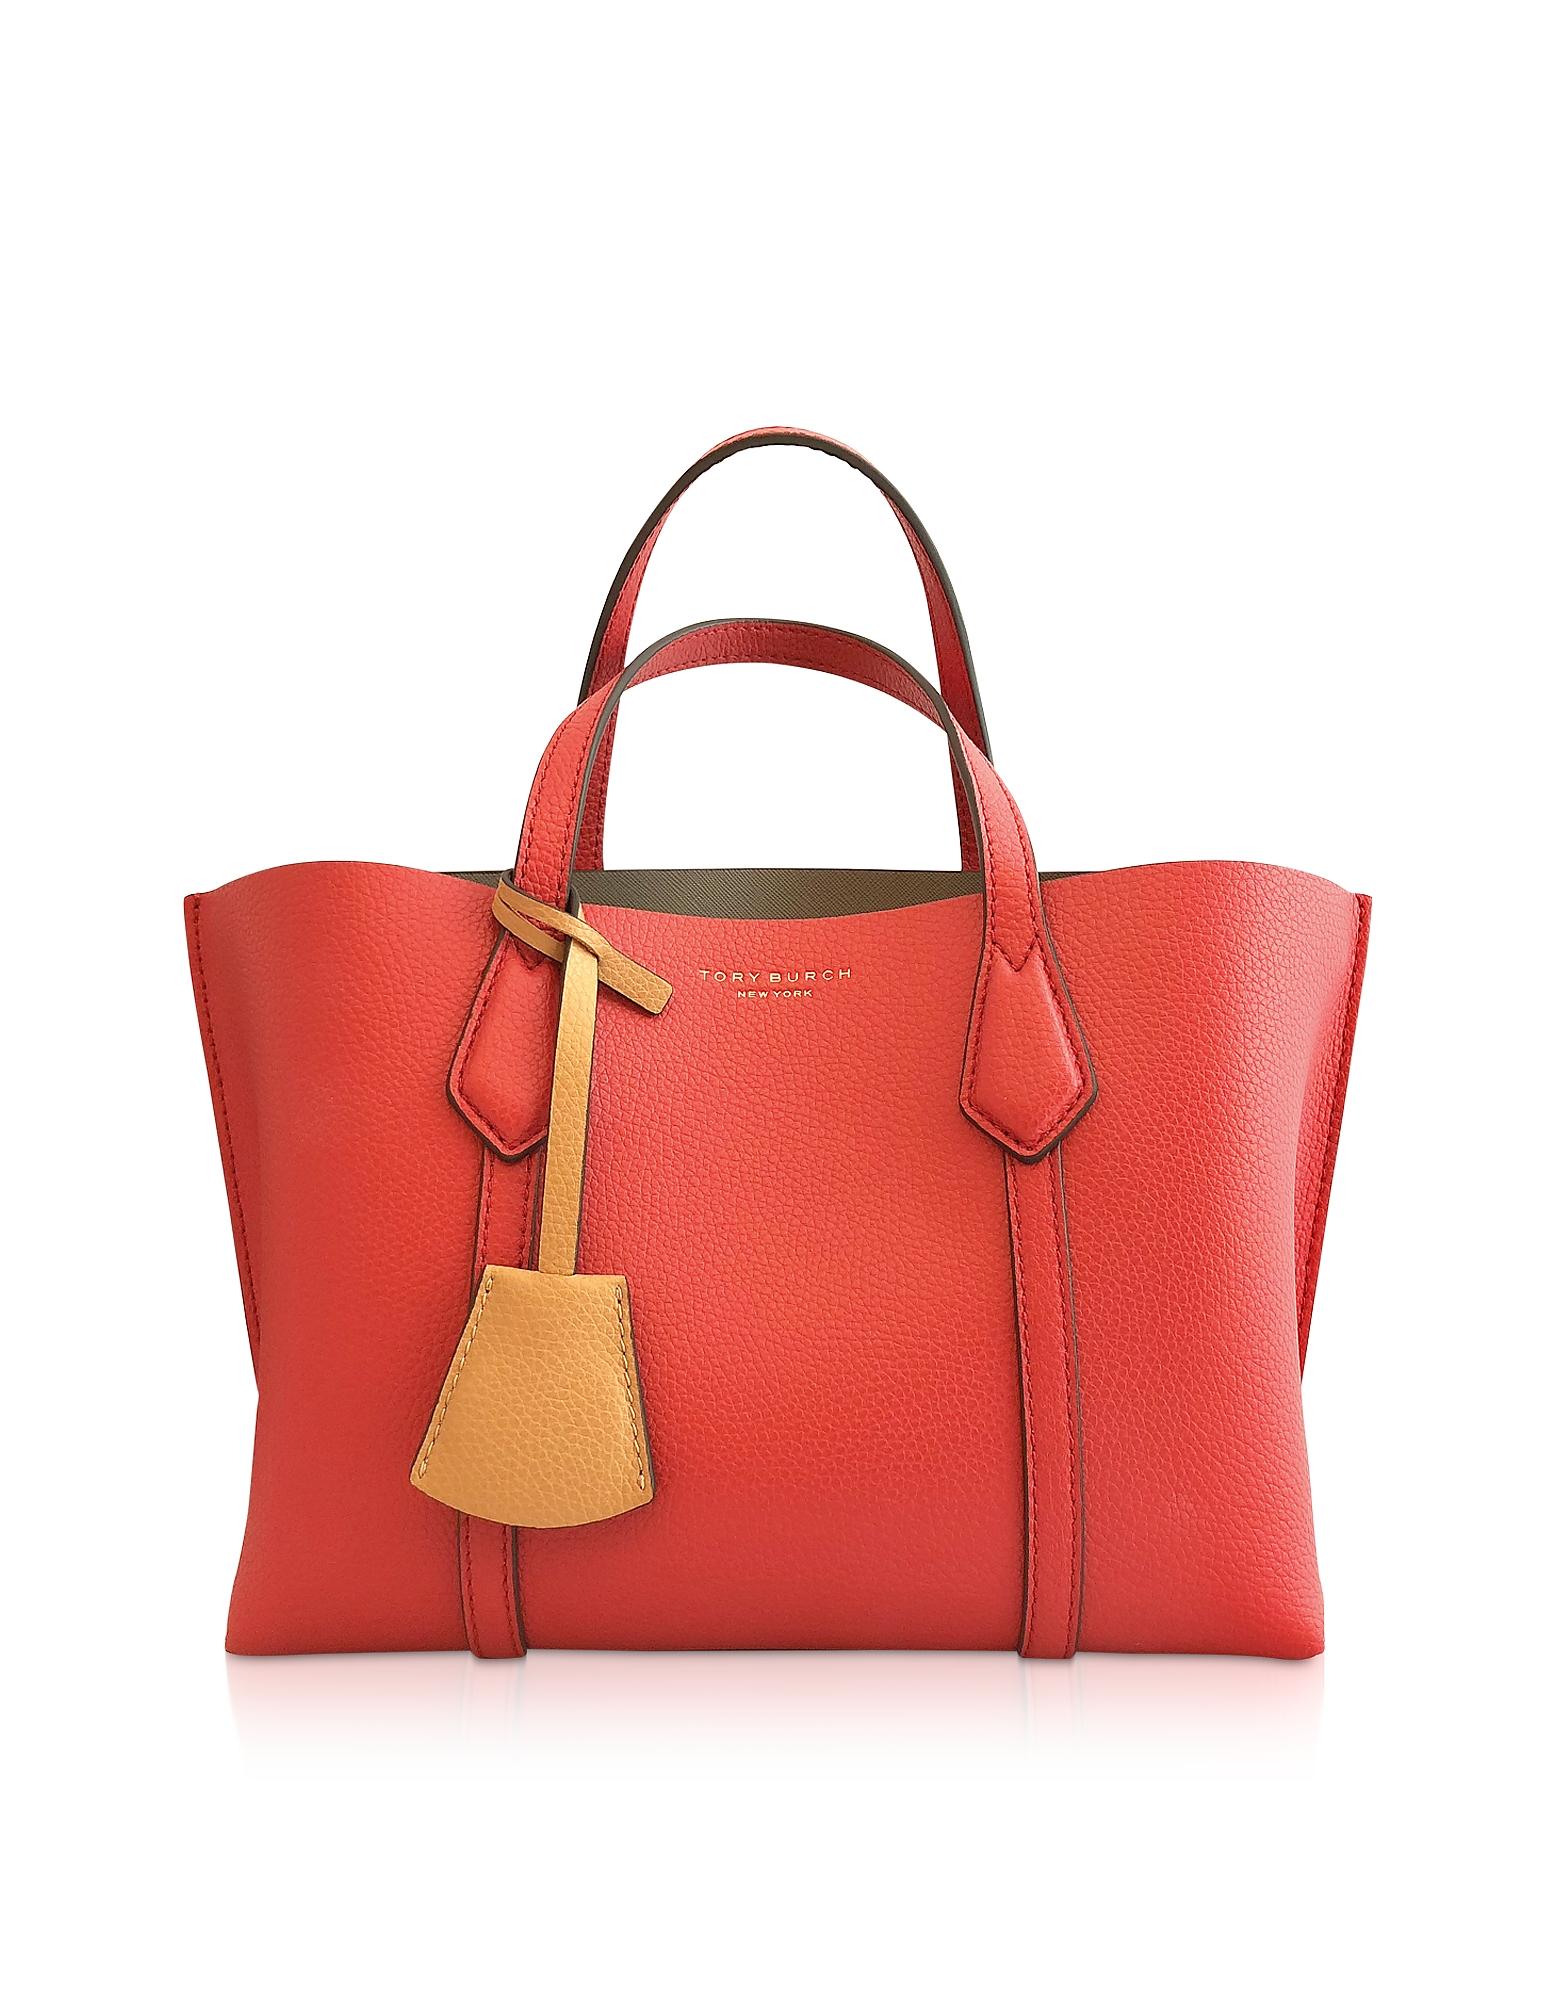 TORY BURCH   Tory Burch Designer Handbags, Brilliant Red Perry Small Triple-Compartment Tote   Goxip